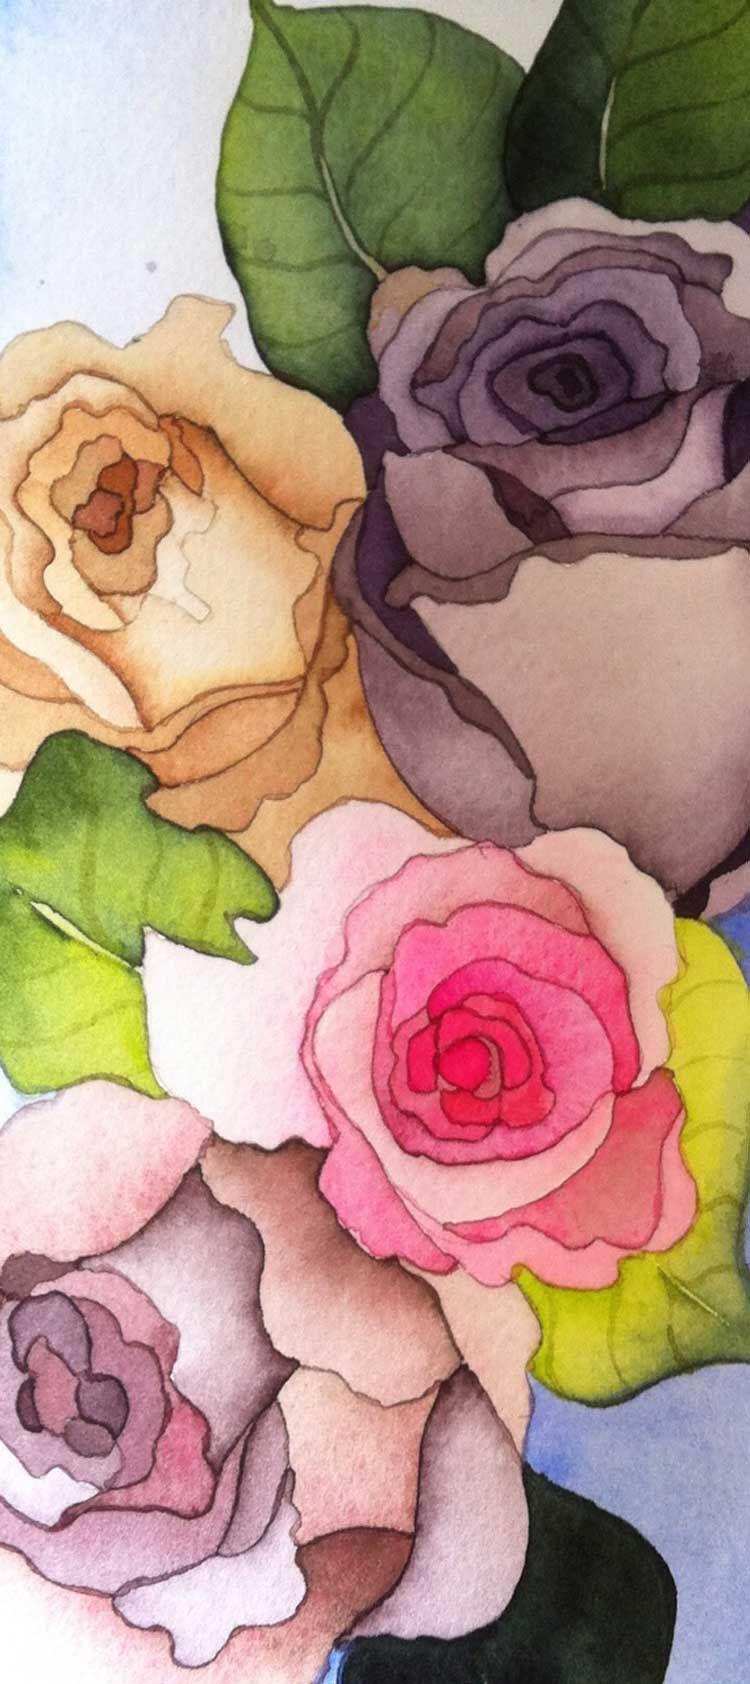 Watercolor artists in texas - Island Made Art A Working Artist Studio Port Aransas Live Mosaic Watercolor